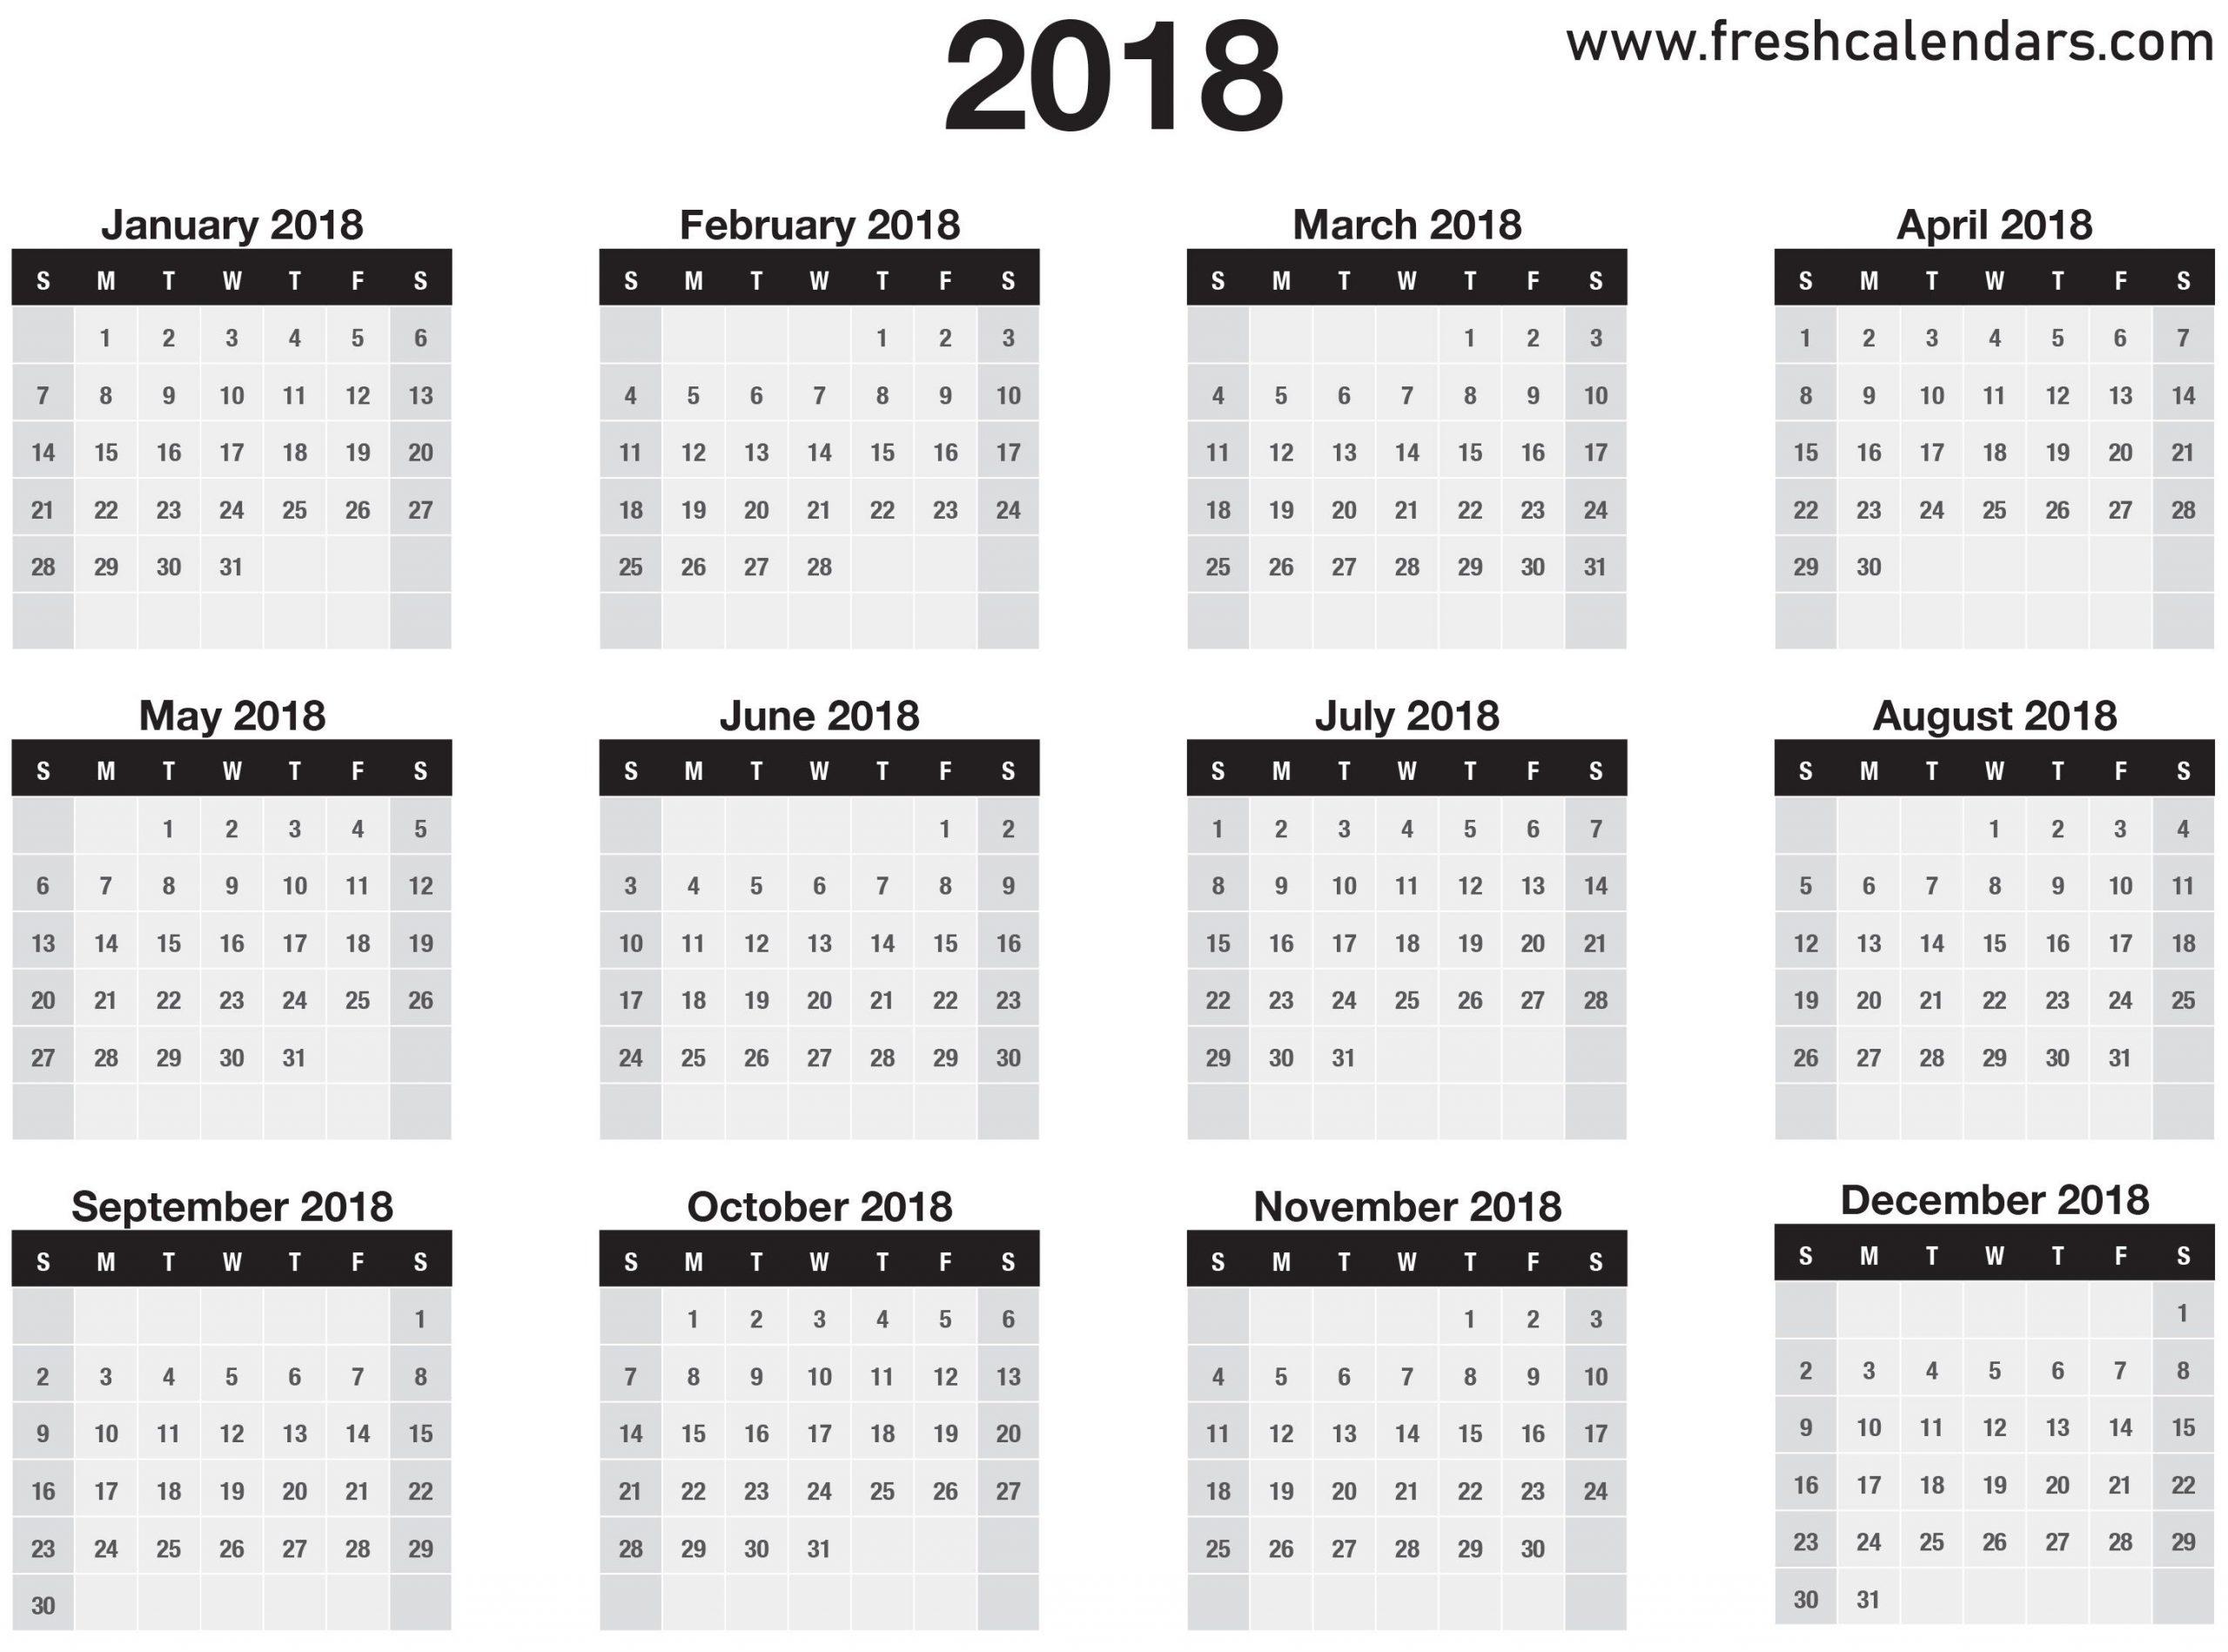 Take Calendar For All 12 Months